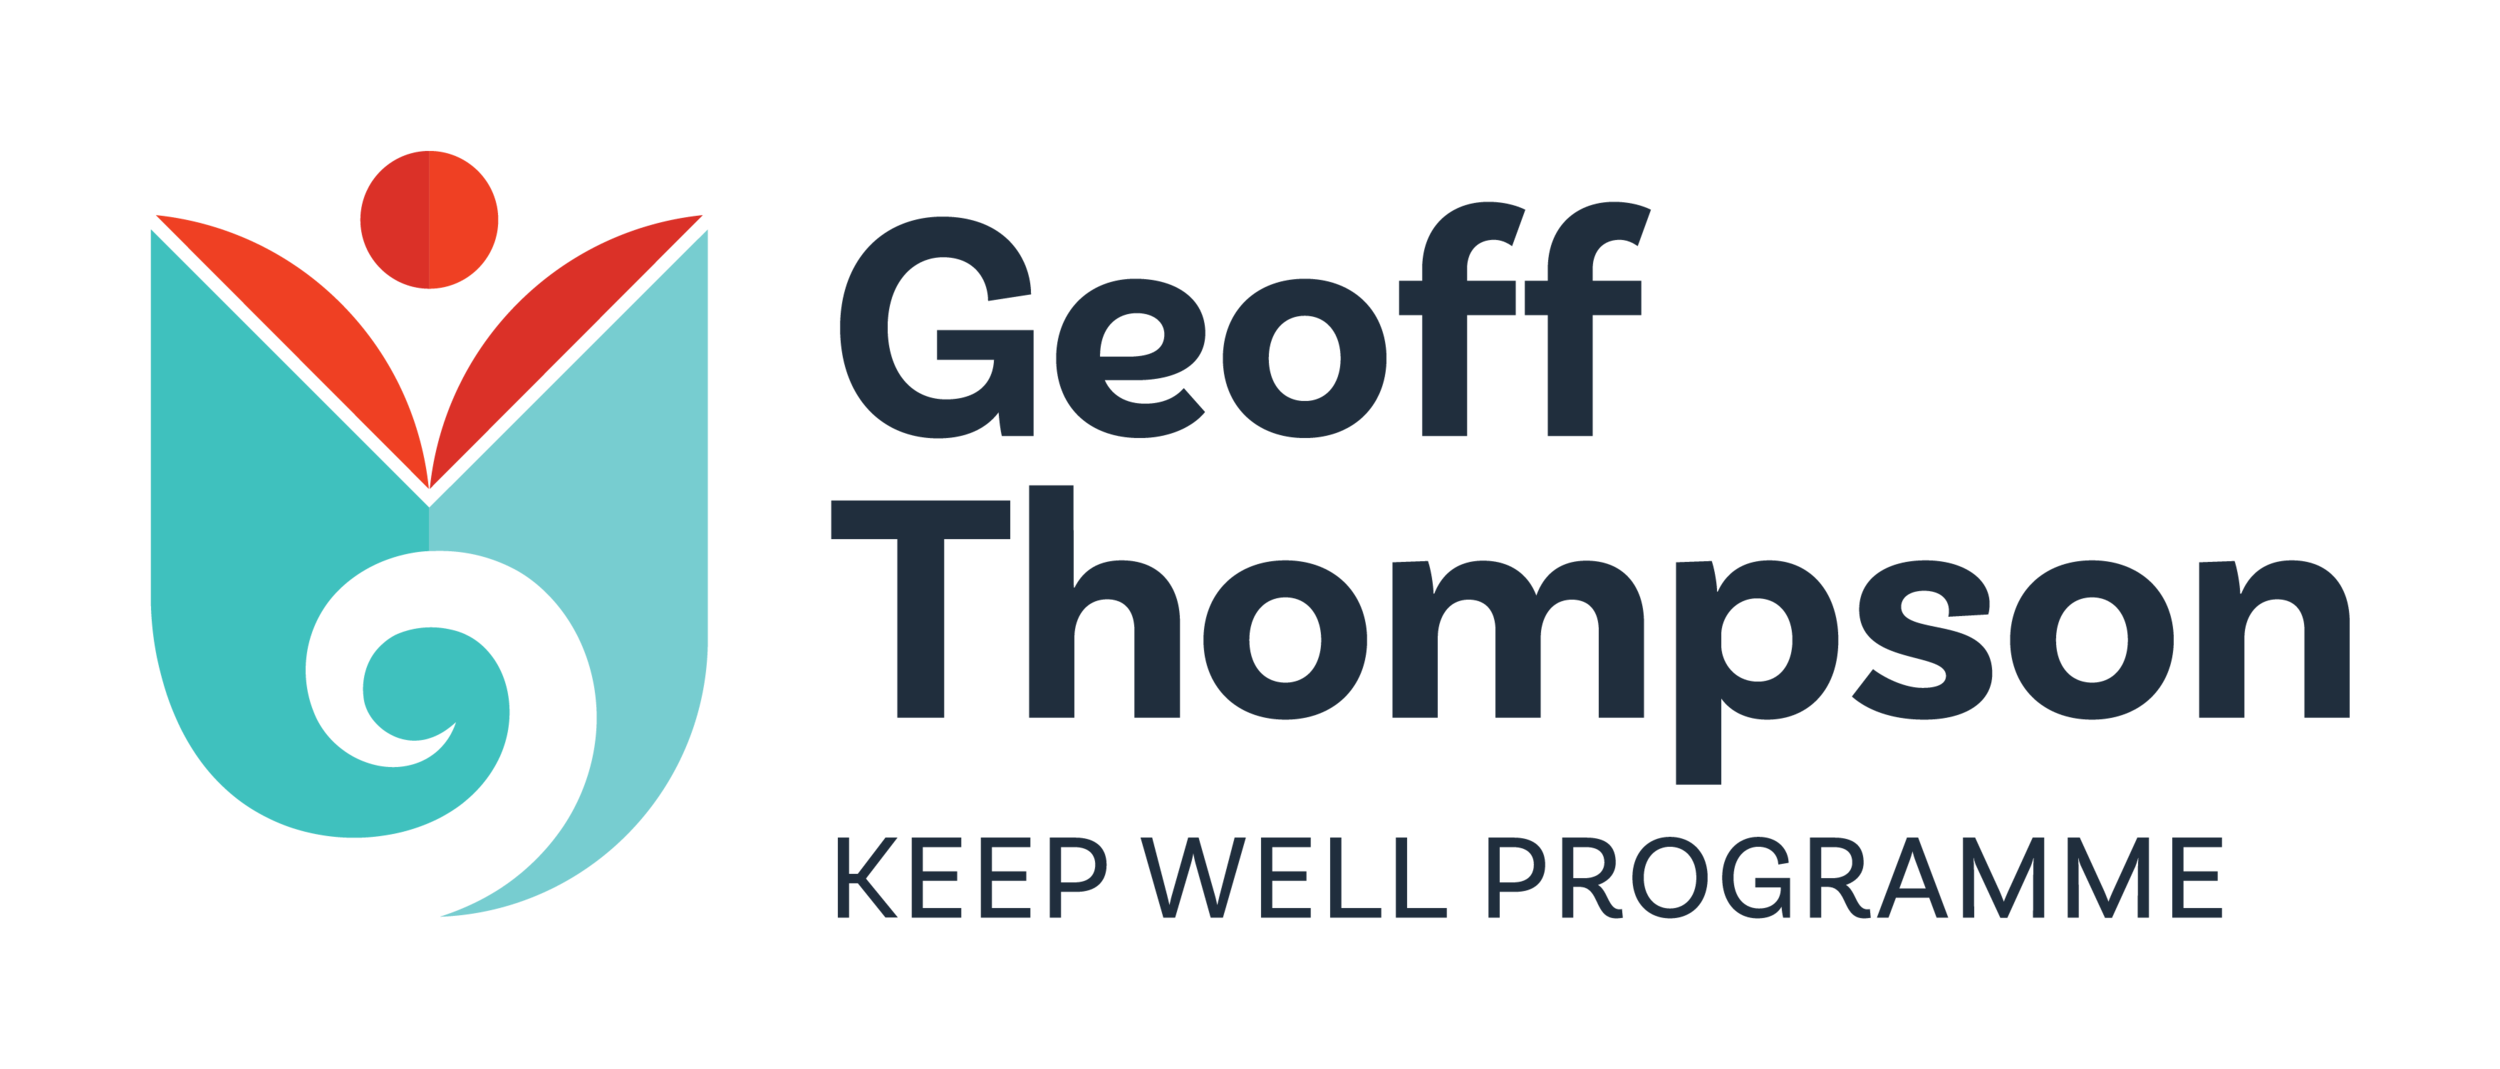 Geoff Thompson programme logo final-02.png